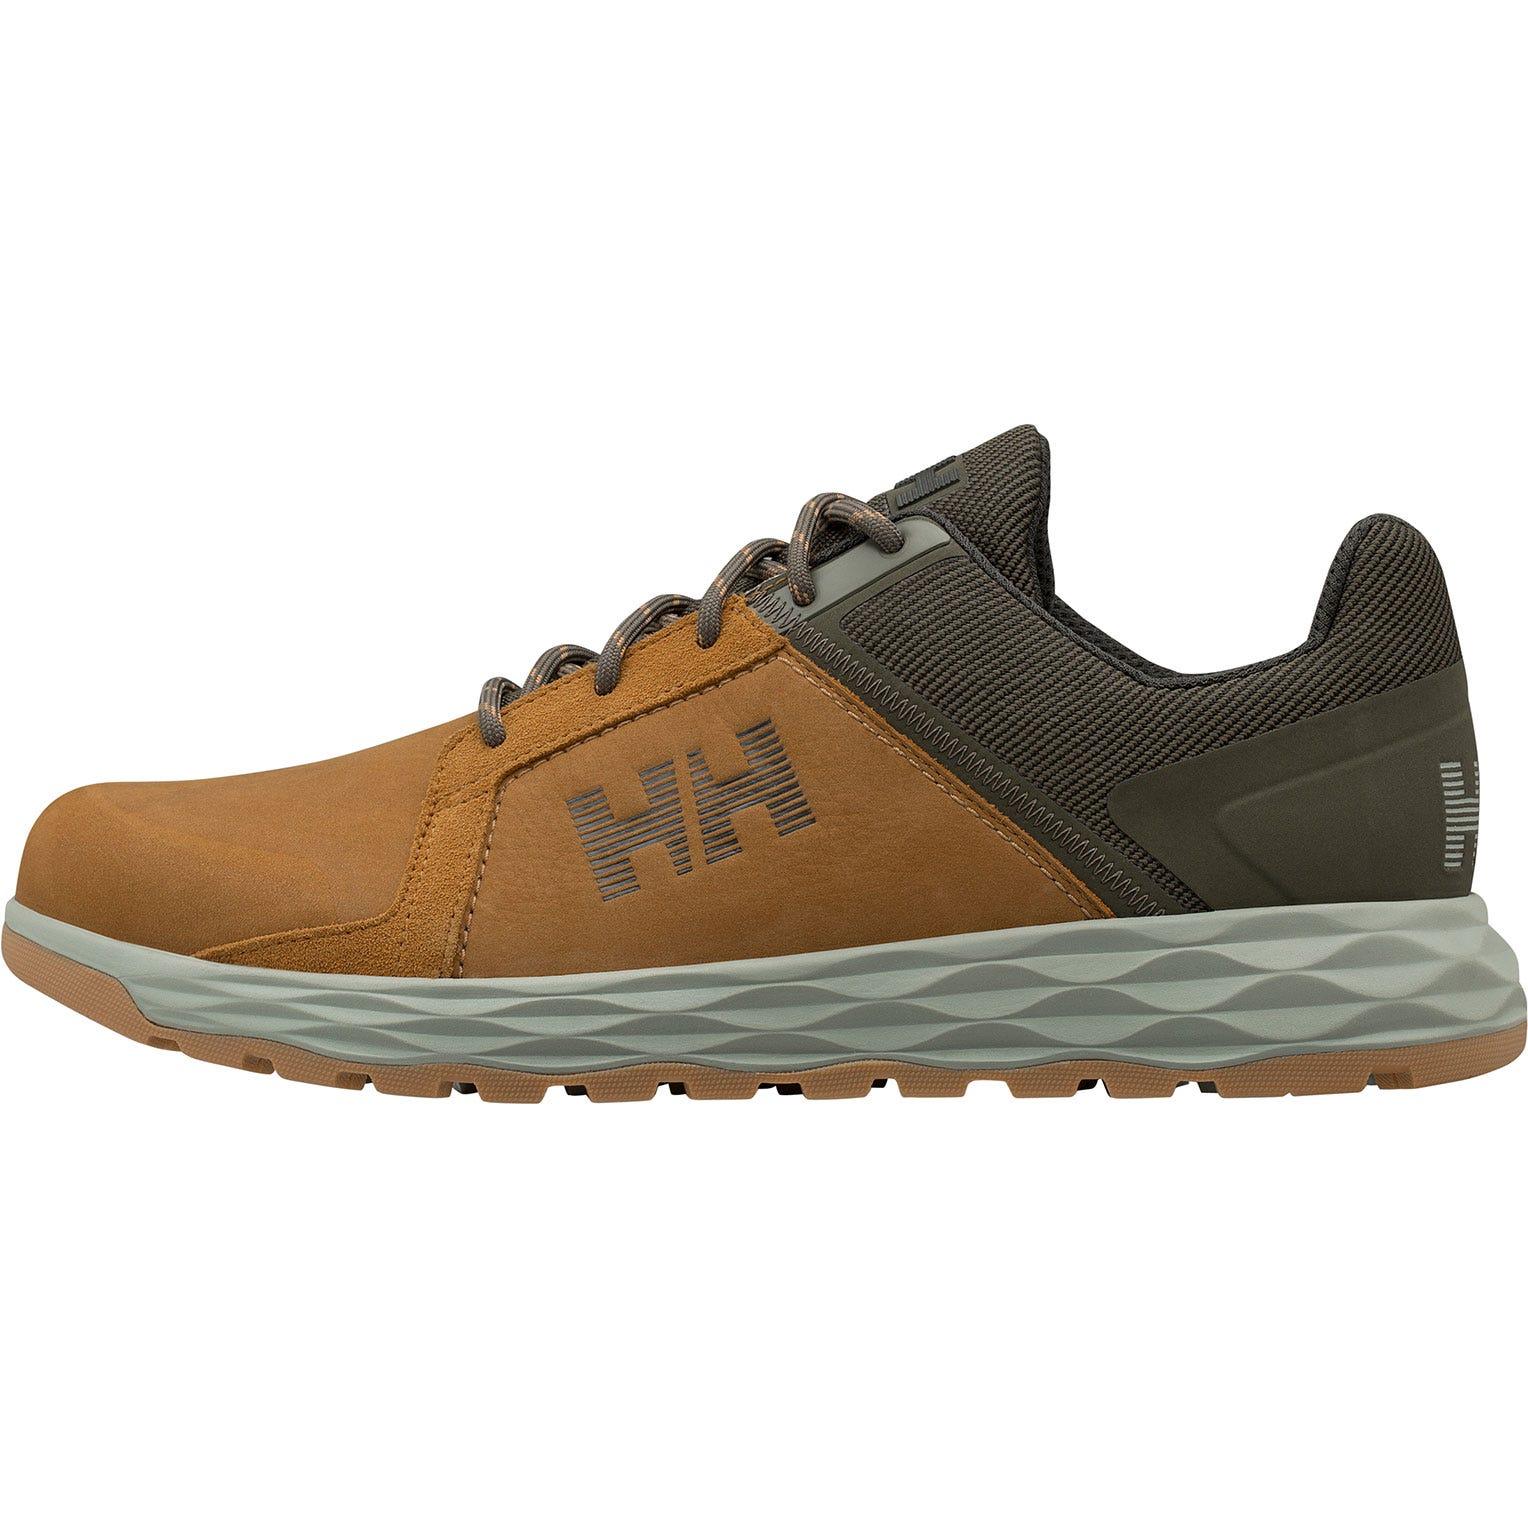 Helly Hansen Gambier Lc Mens Casual Shoe Brown 44.5/10.5